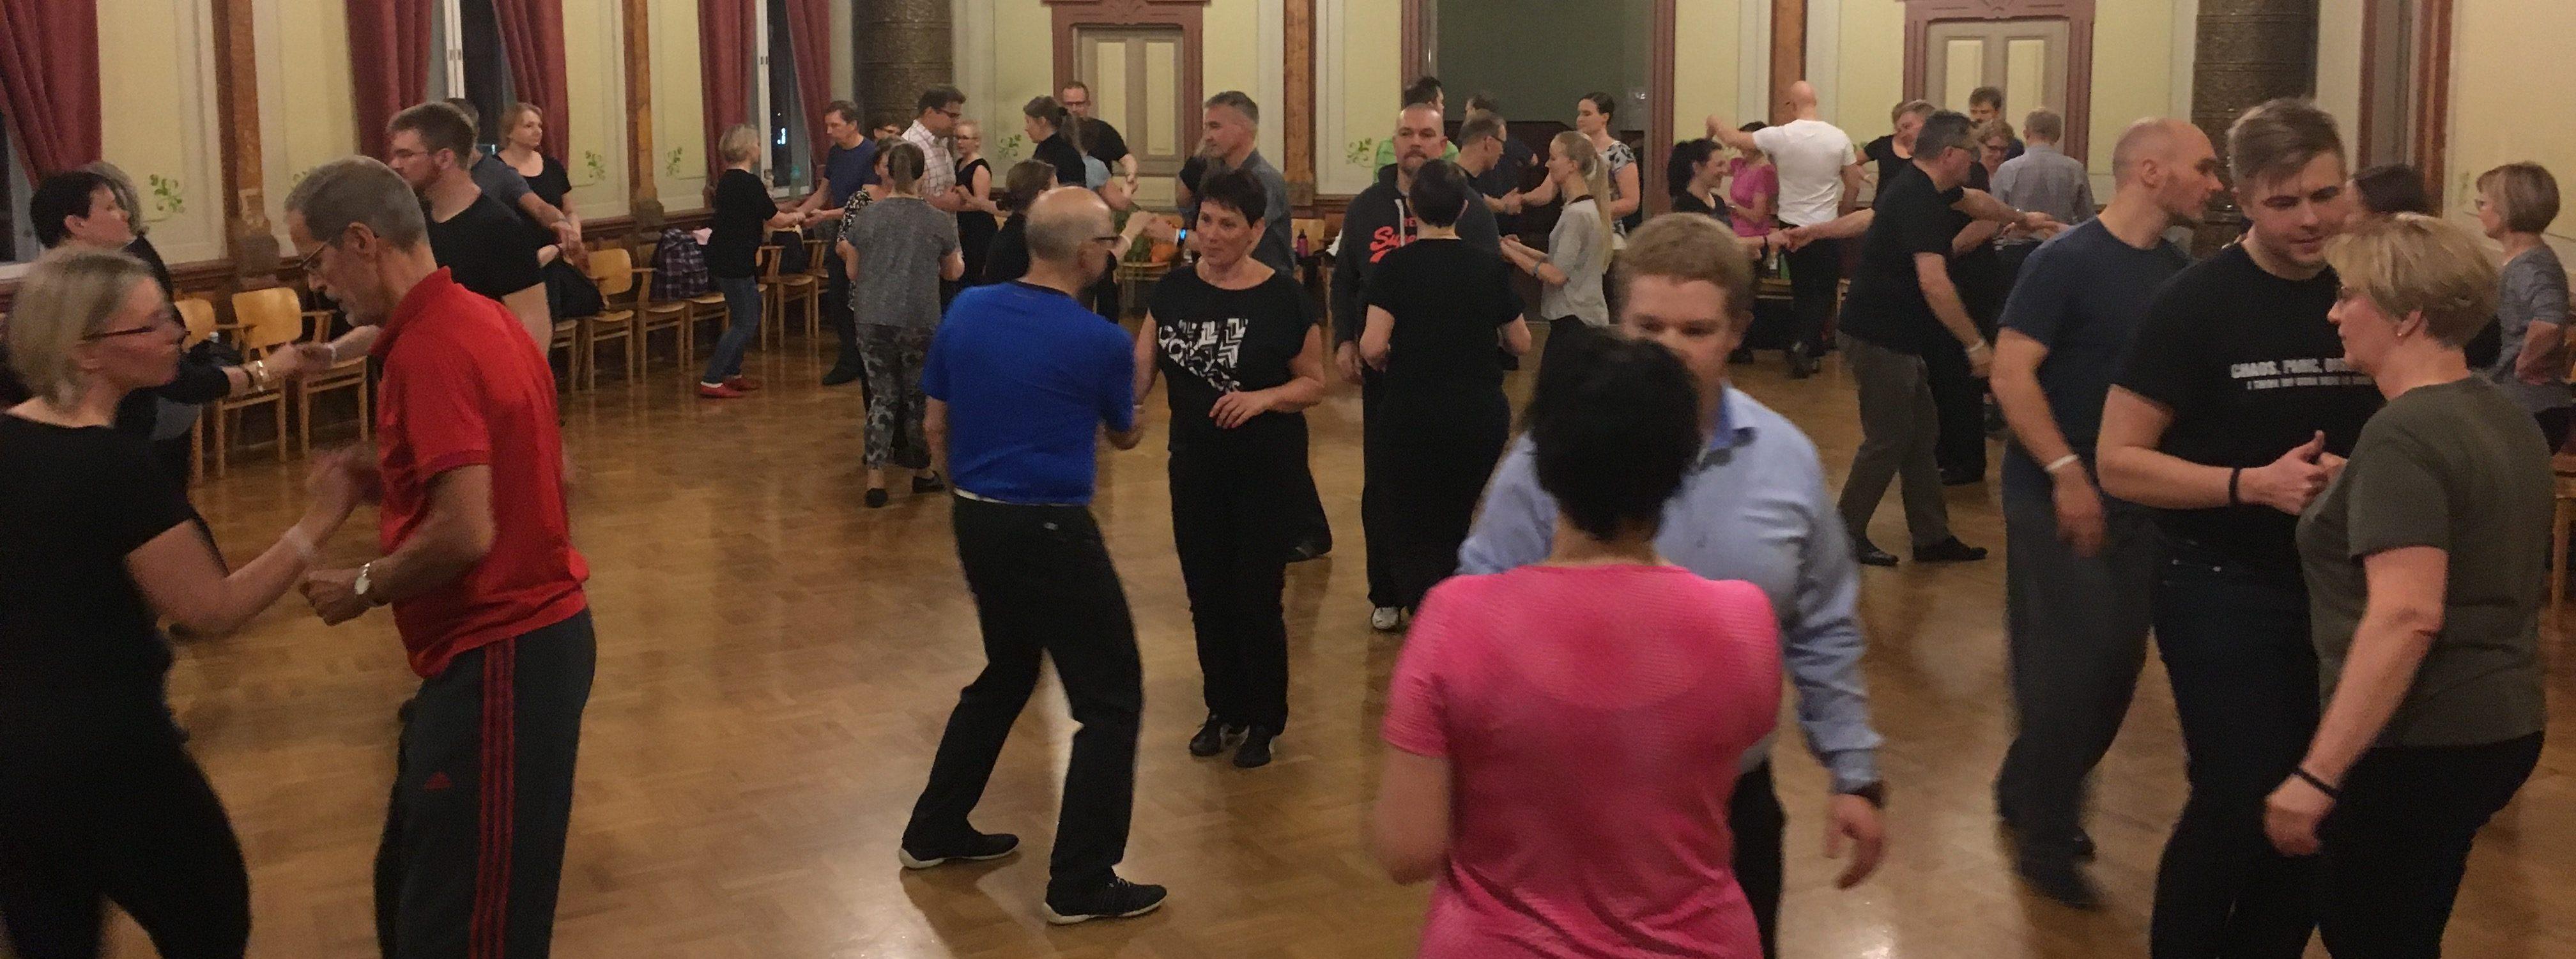 tanssikurssit hämeenlinna hierontakurssi helsinki